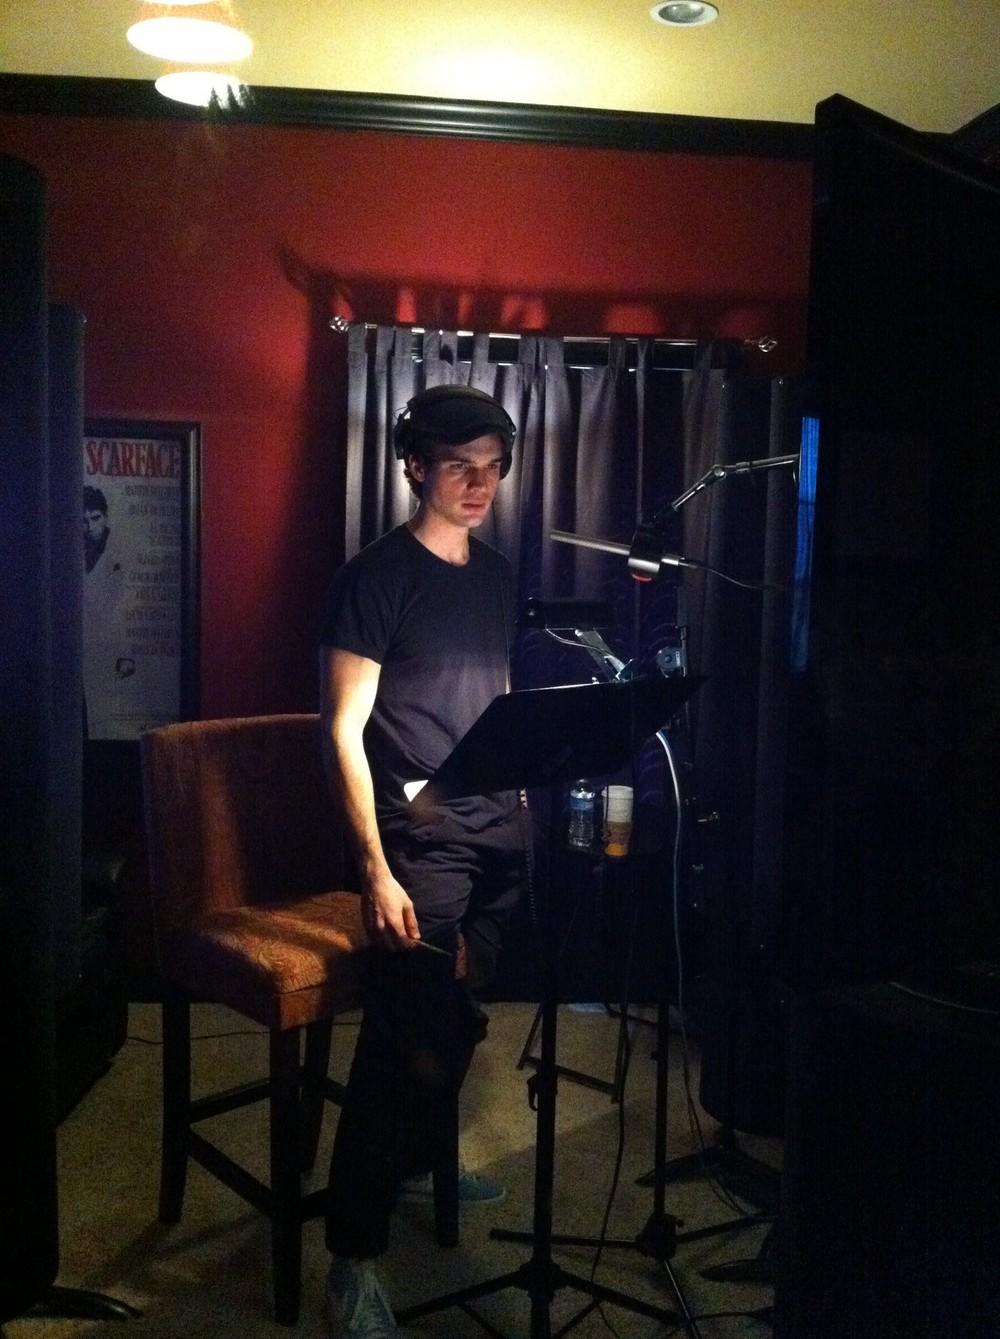 Steven recording ADR